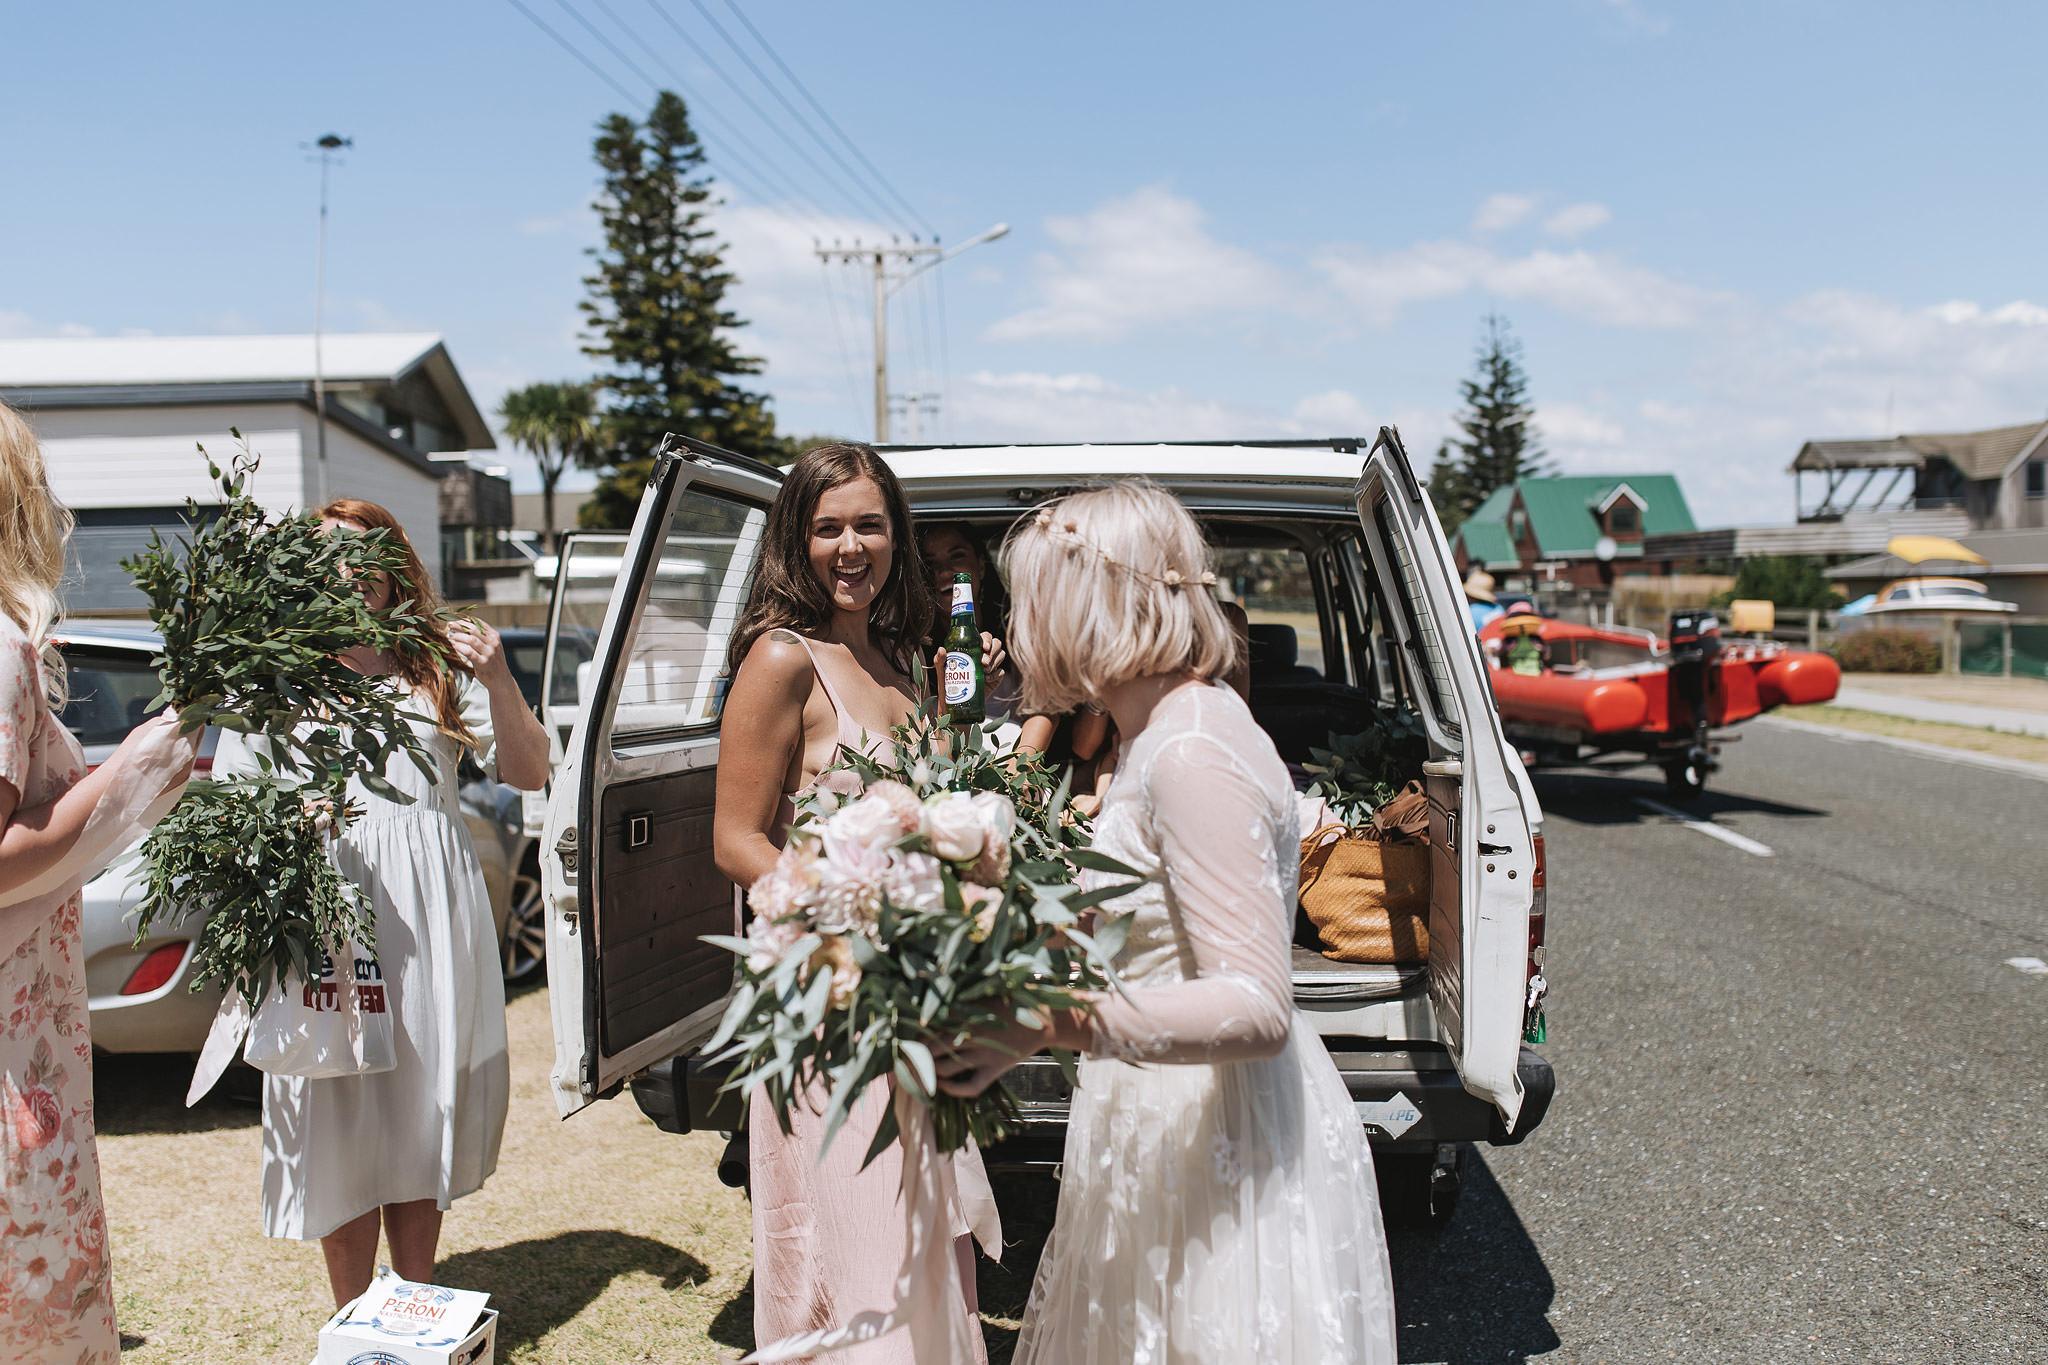 rambo-estrada-natalieryan-old-forest-school-tauranga-wedding-photographers-197-c-copy.jpg